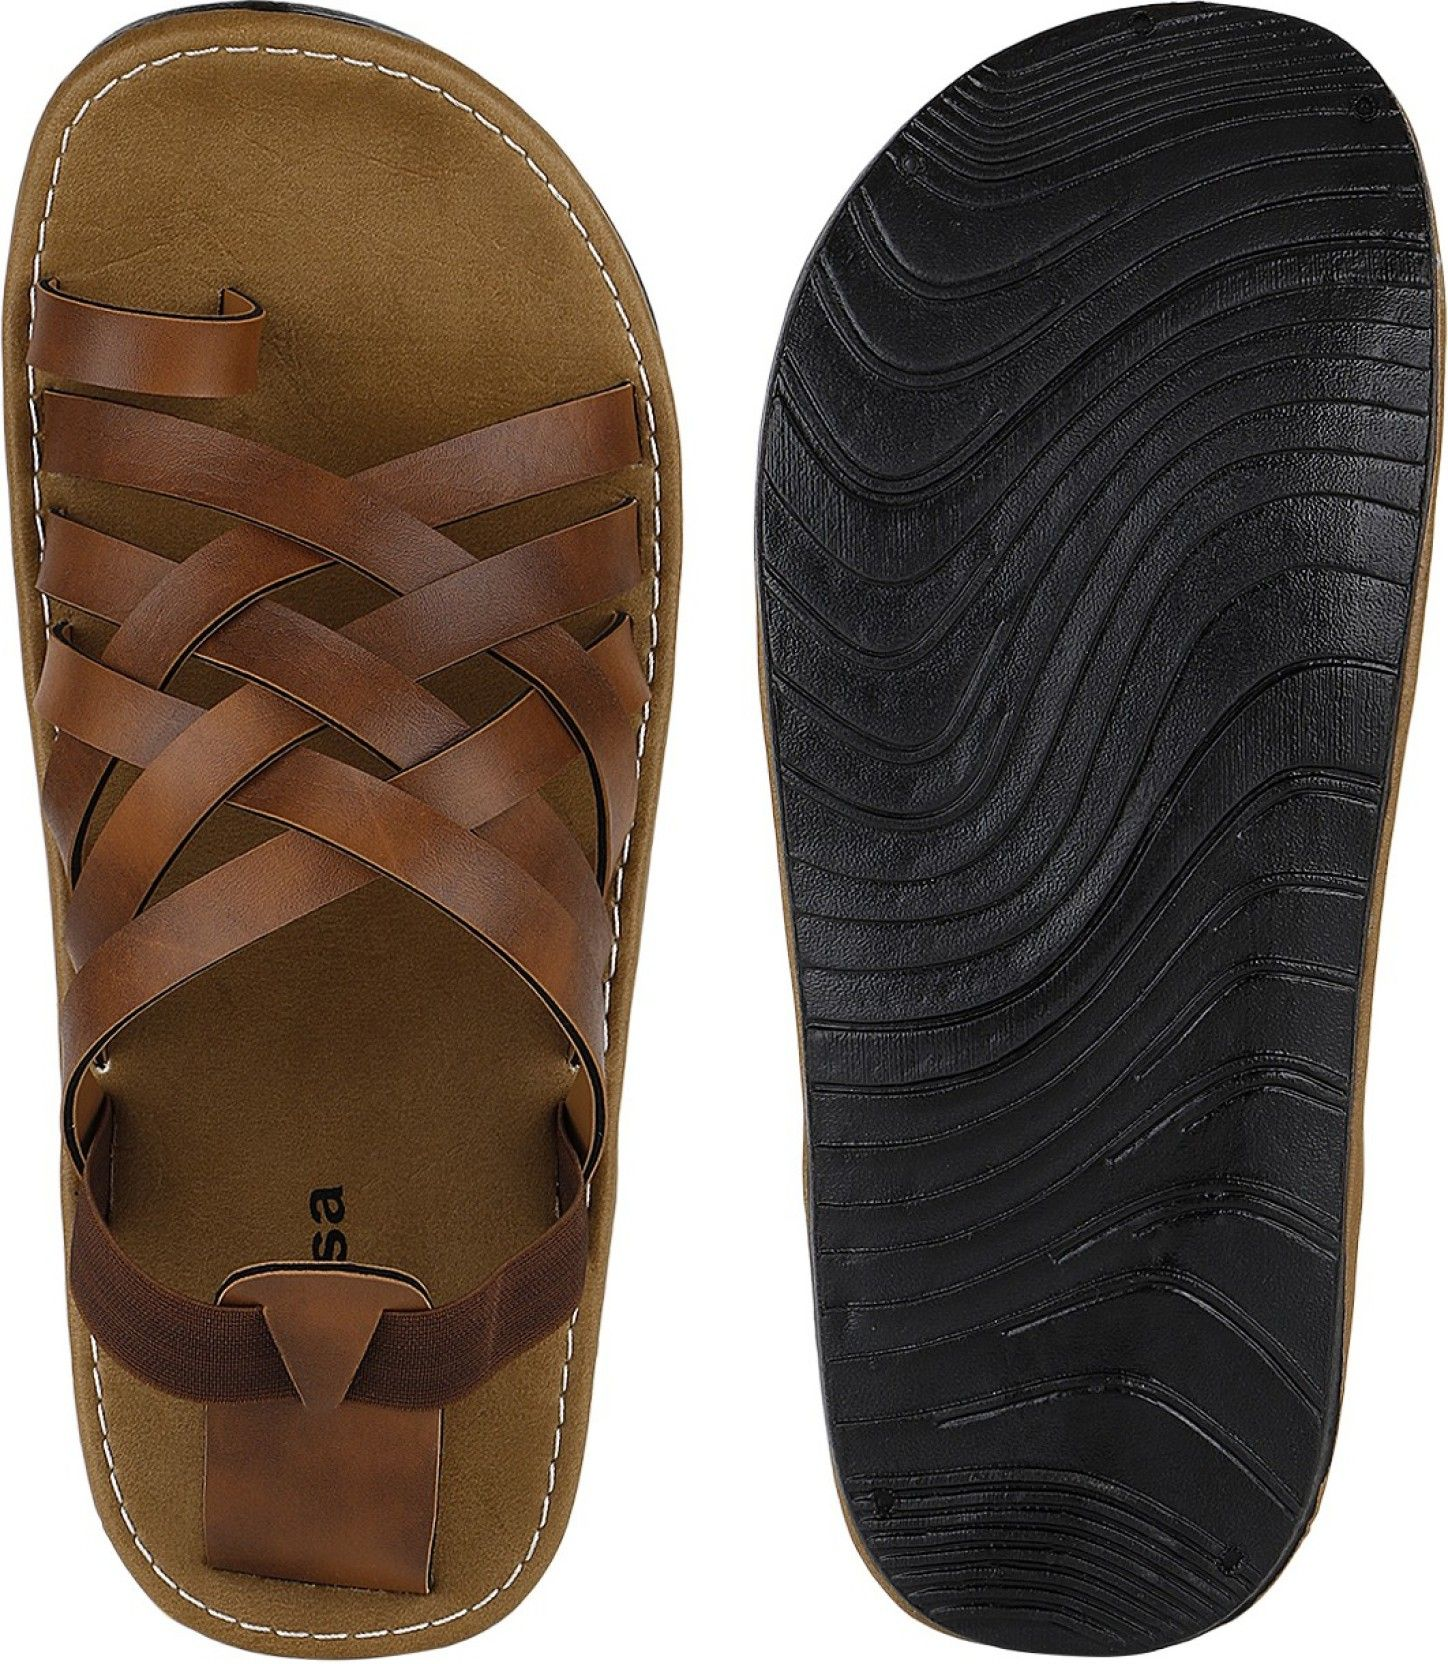 Black sandals online - Kraasa Men Black Sandals Buy Black Color Kraasa Men Black Sandals Online At Best Price